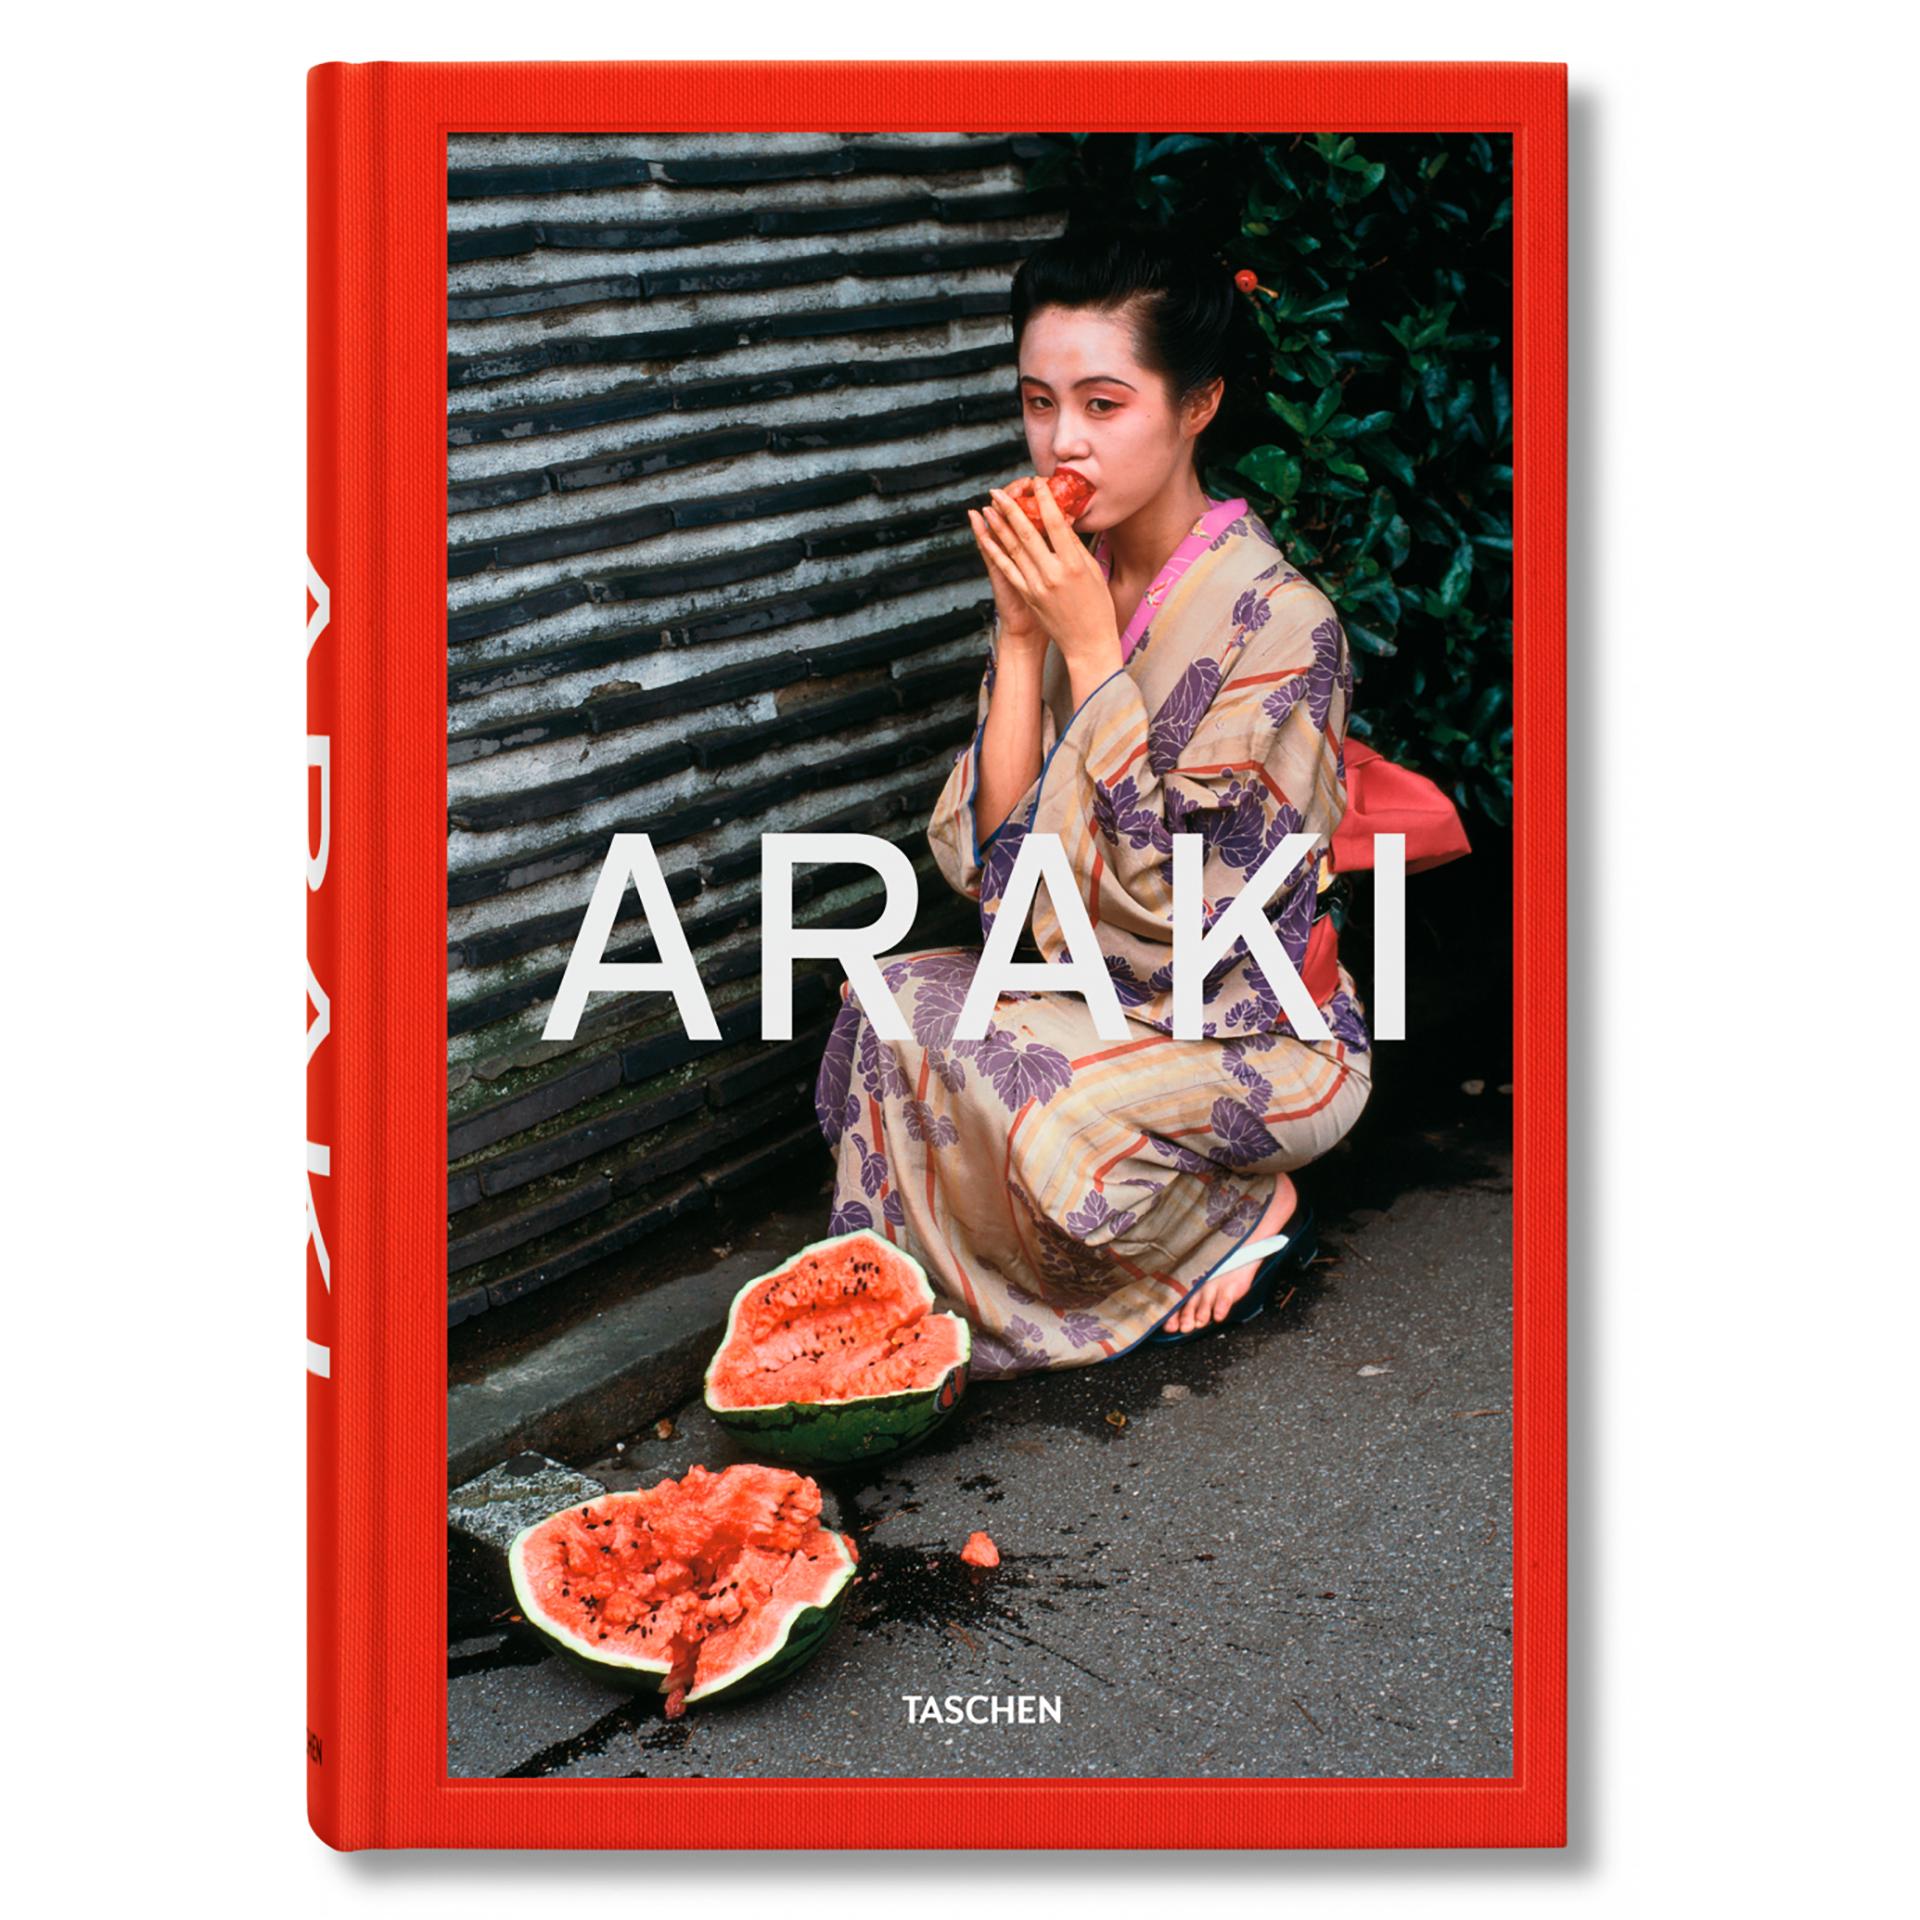 Araki by araki - R1450.jpg